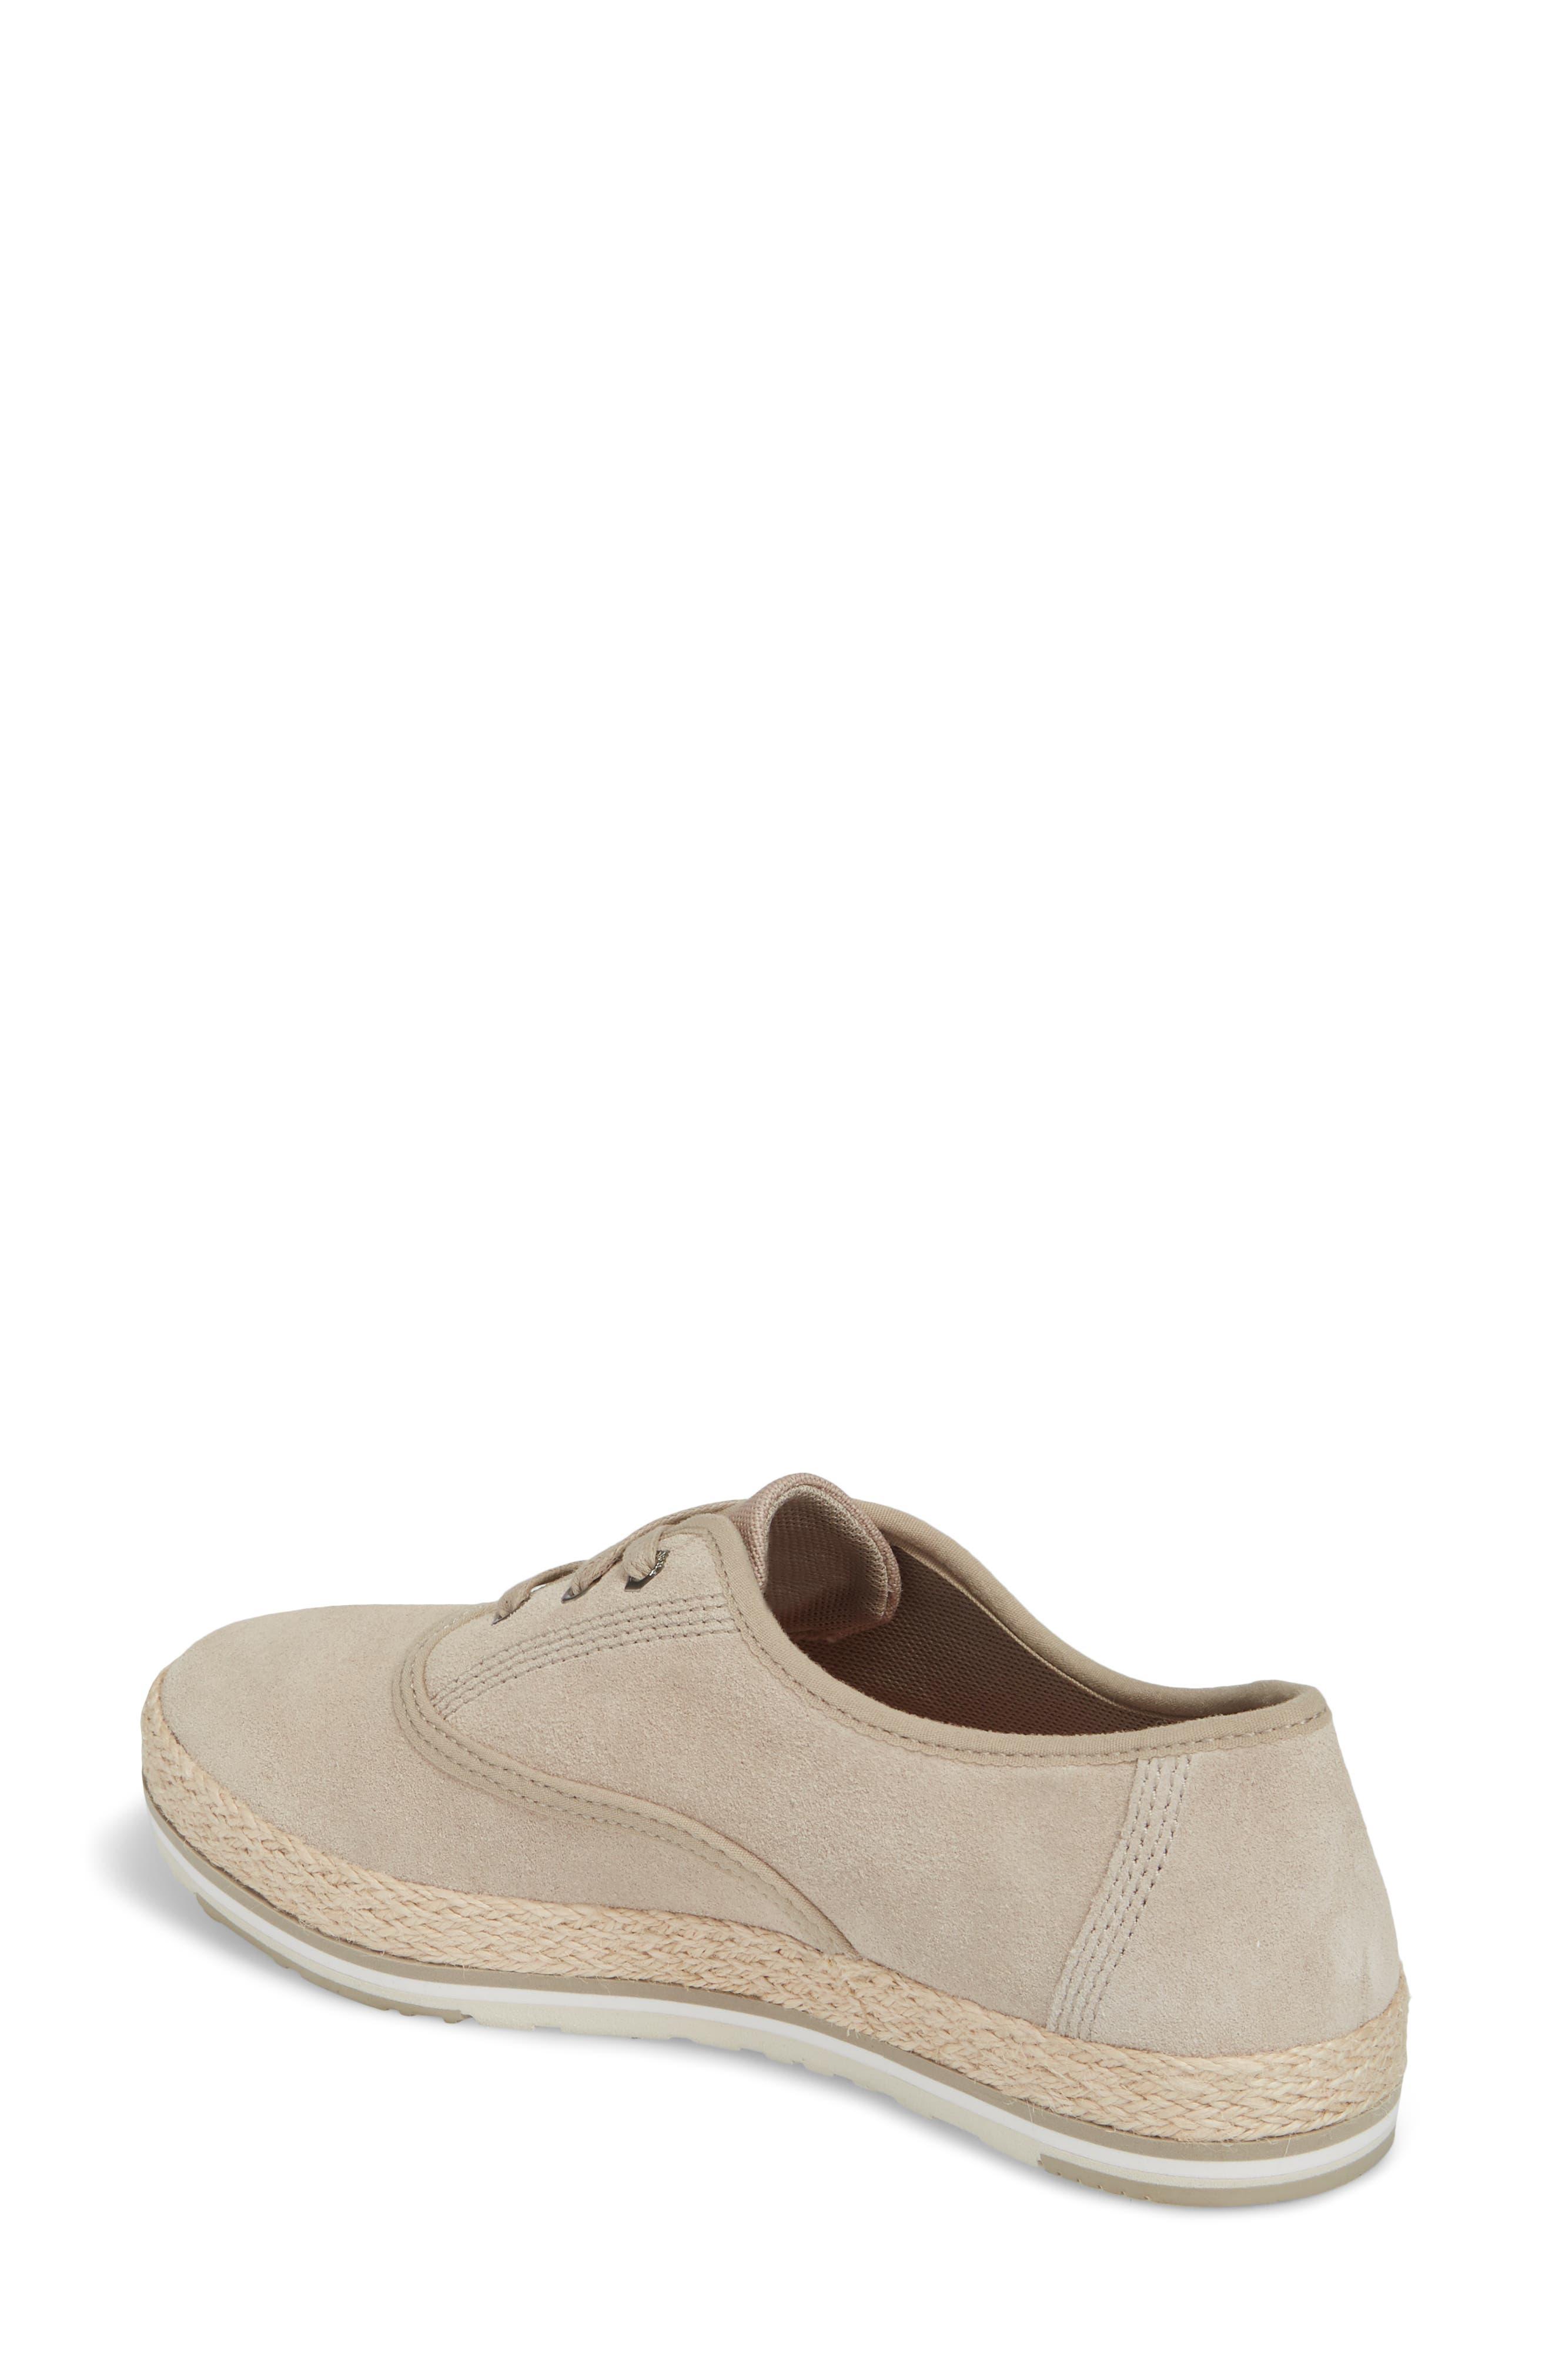 Eivissa Sea Oxford Sneaker,                             Alternate thumbnail 2, color,                             270